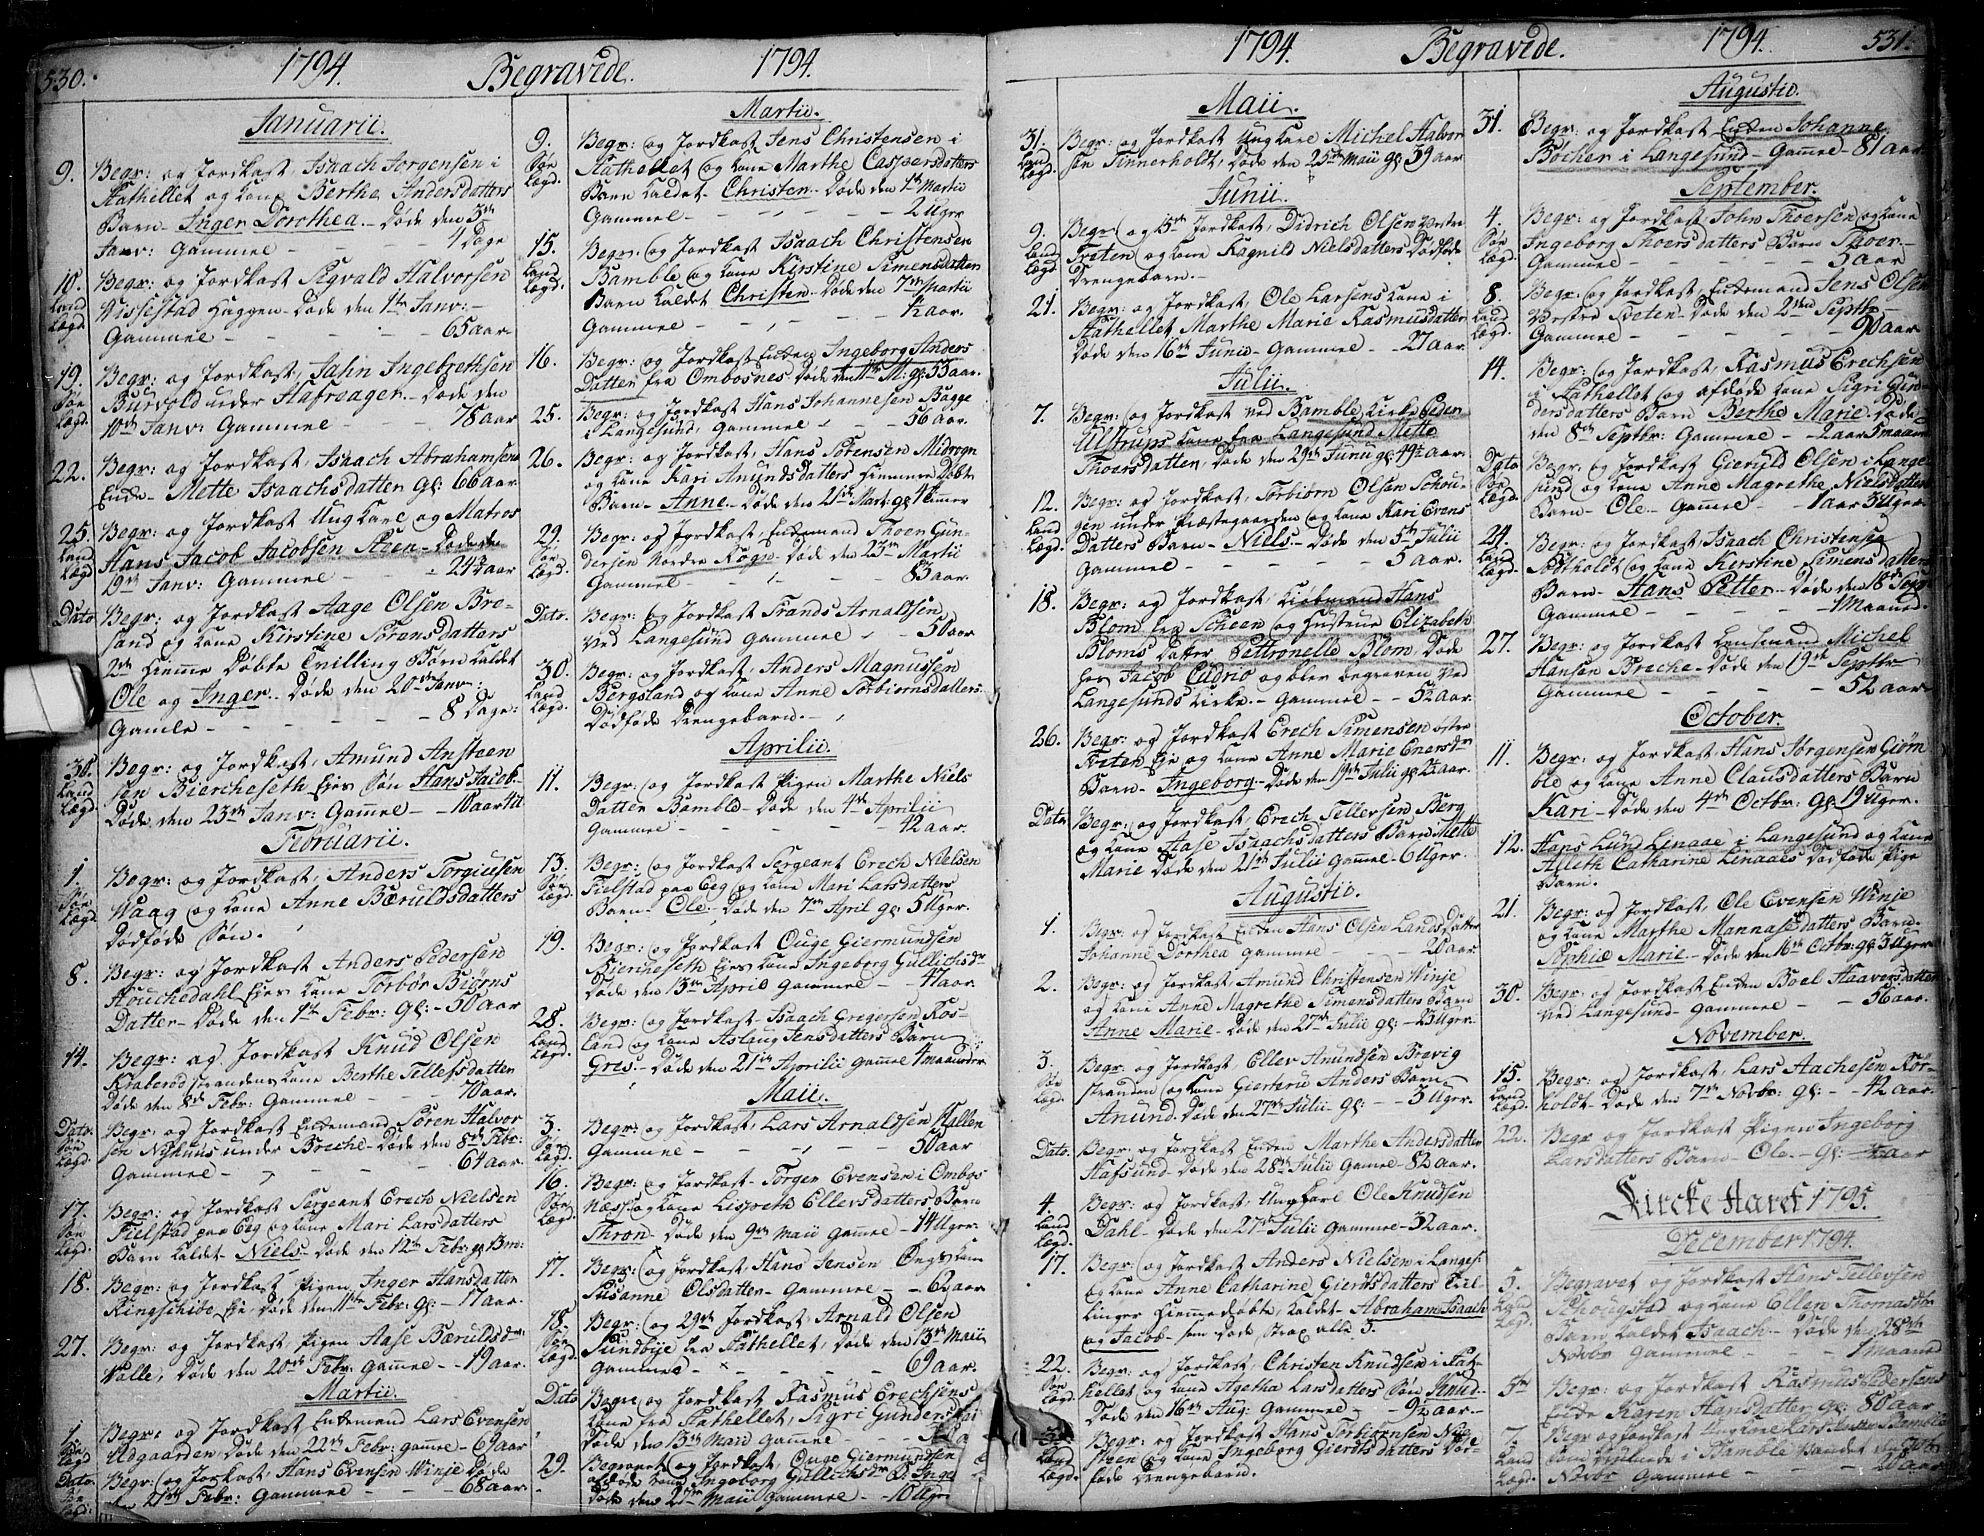 SAKO, Bamble kirkebøker, F/Fa/L0002: Ministerialbok nr. I 2, 1775-1814, s. 530-531